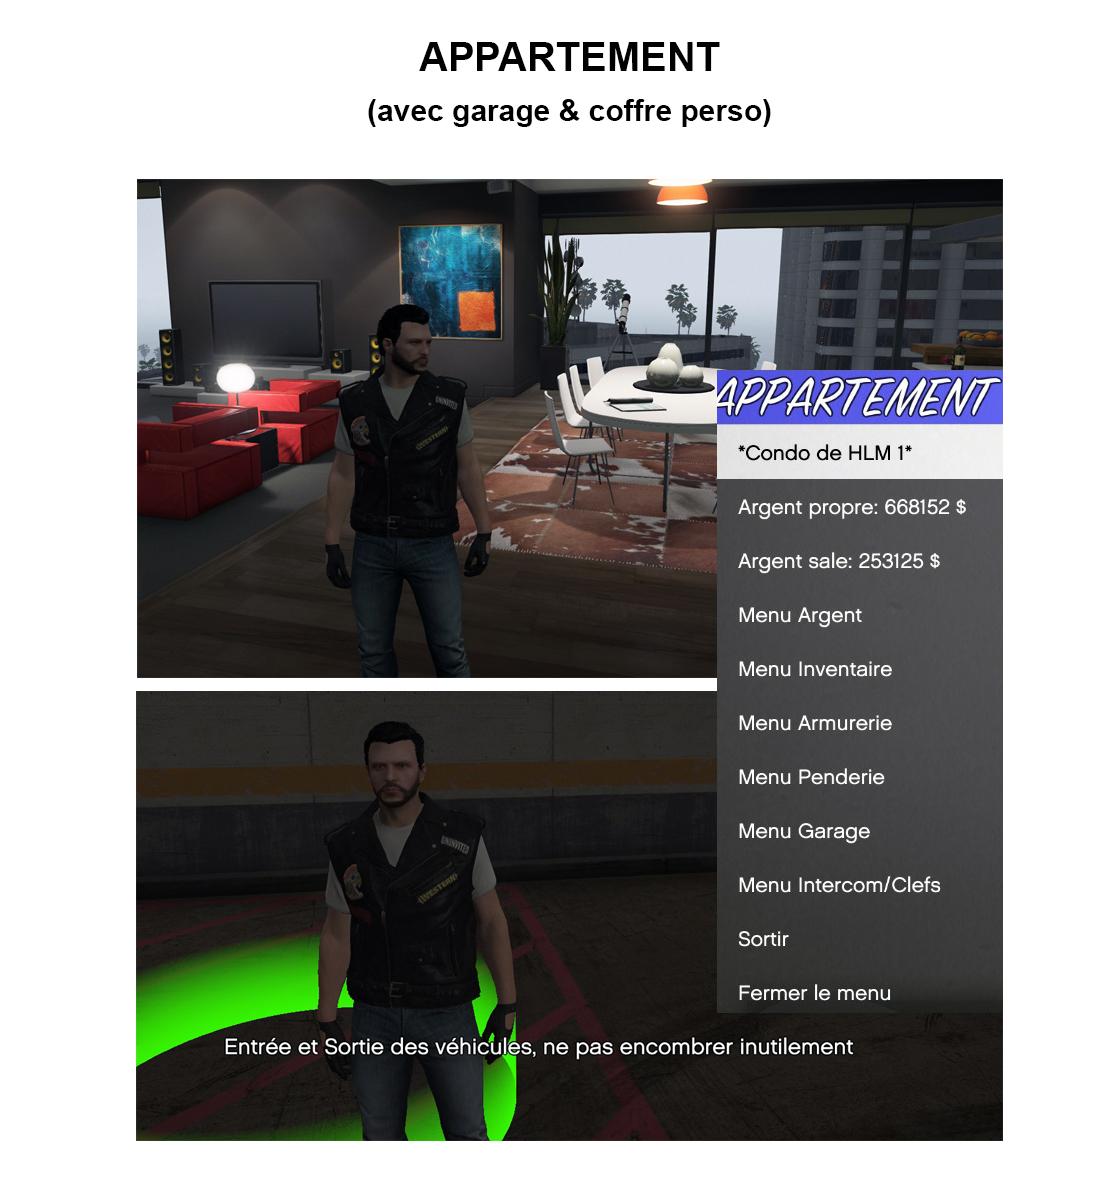 59c56a6c96c80-appartement.jpg